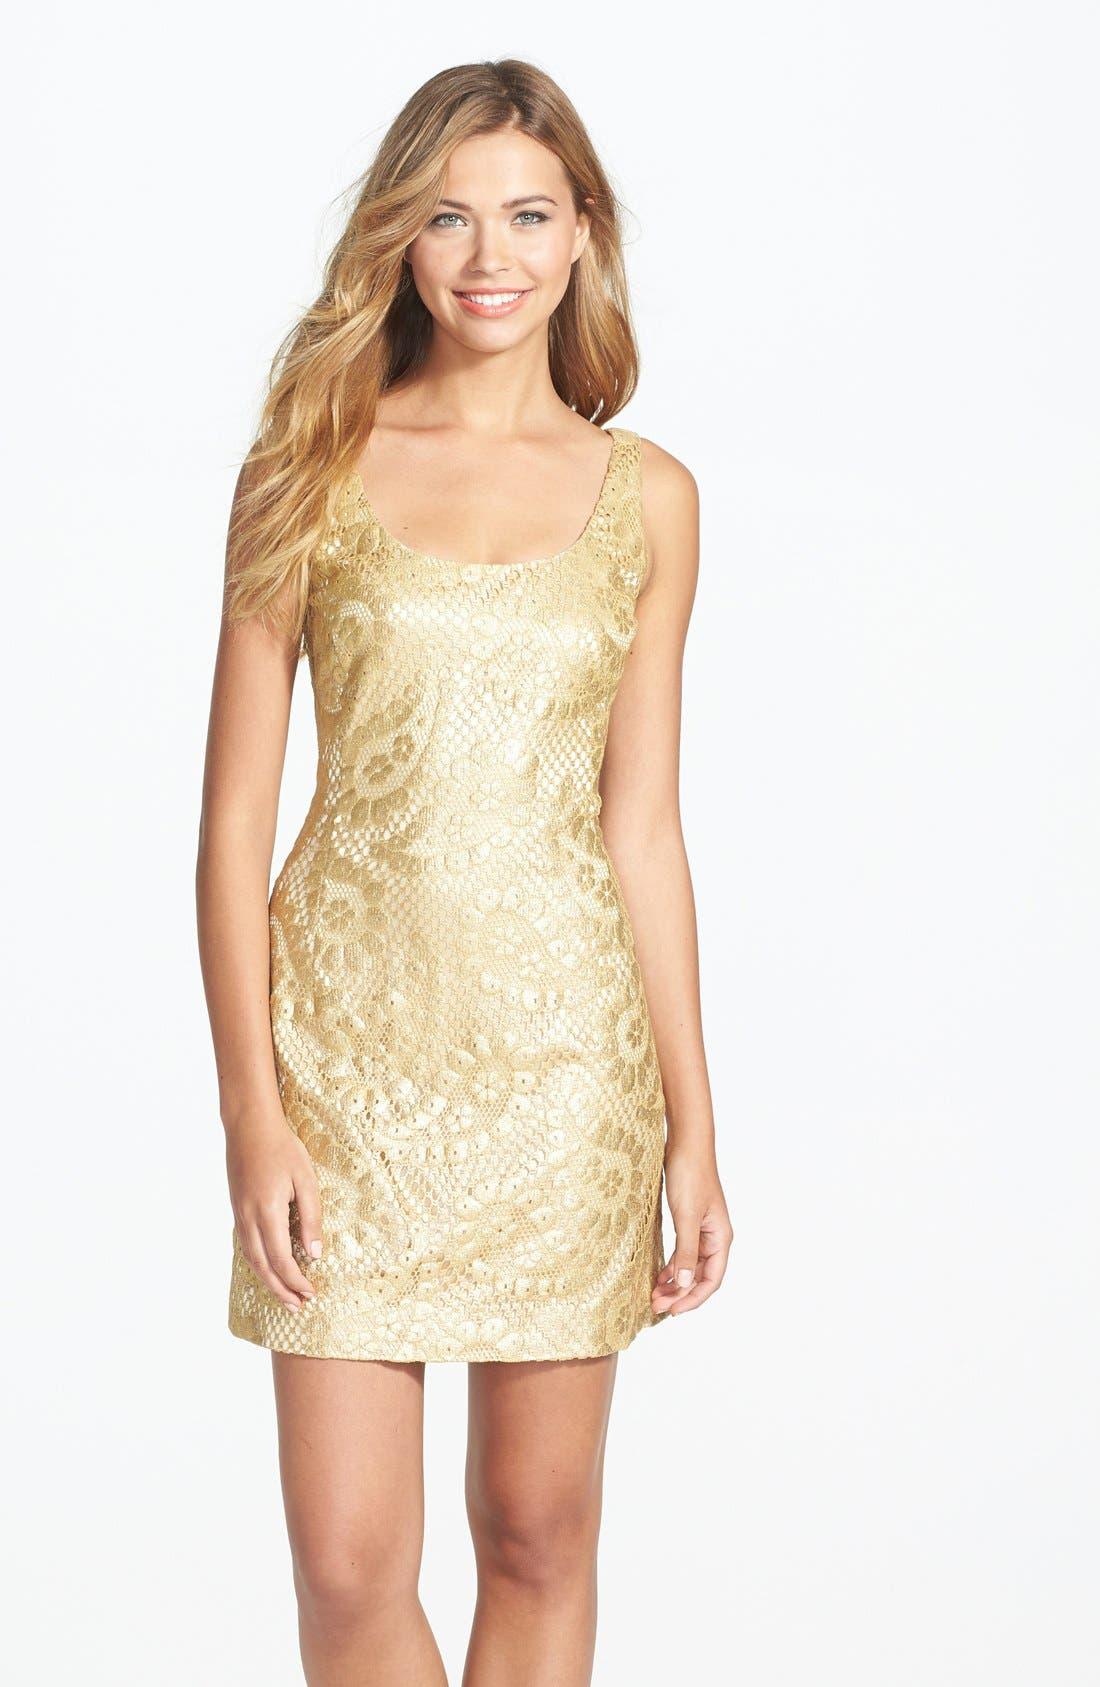 Alternate Image 1 Selected - Lilly Pulitzer® 'Eaton' Metallic Paisley Shift Dress